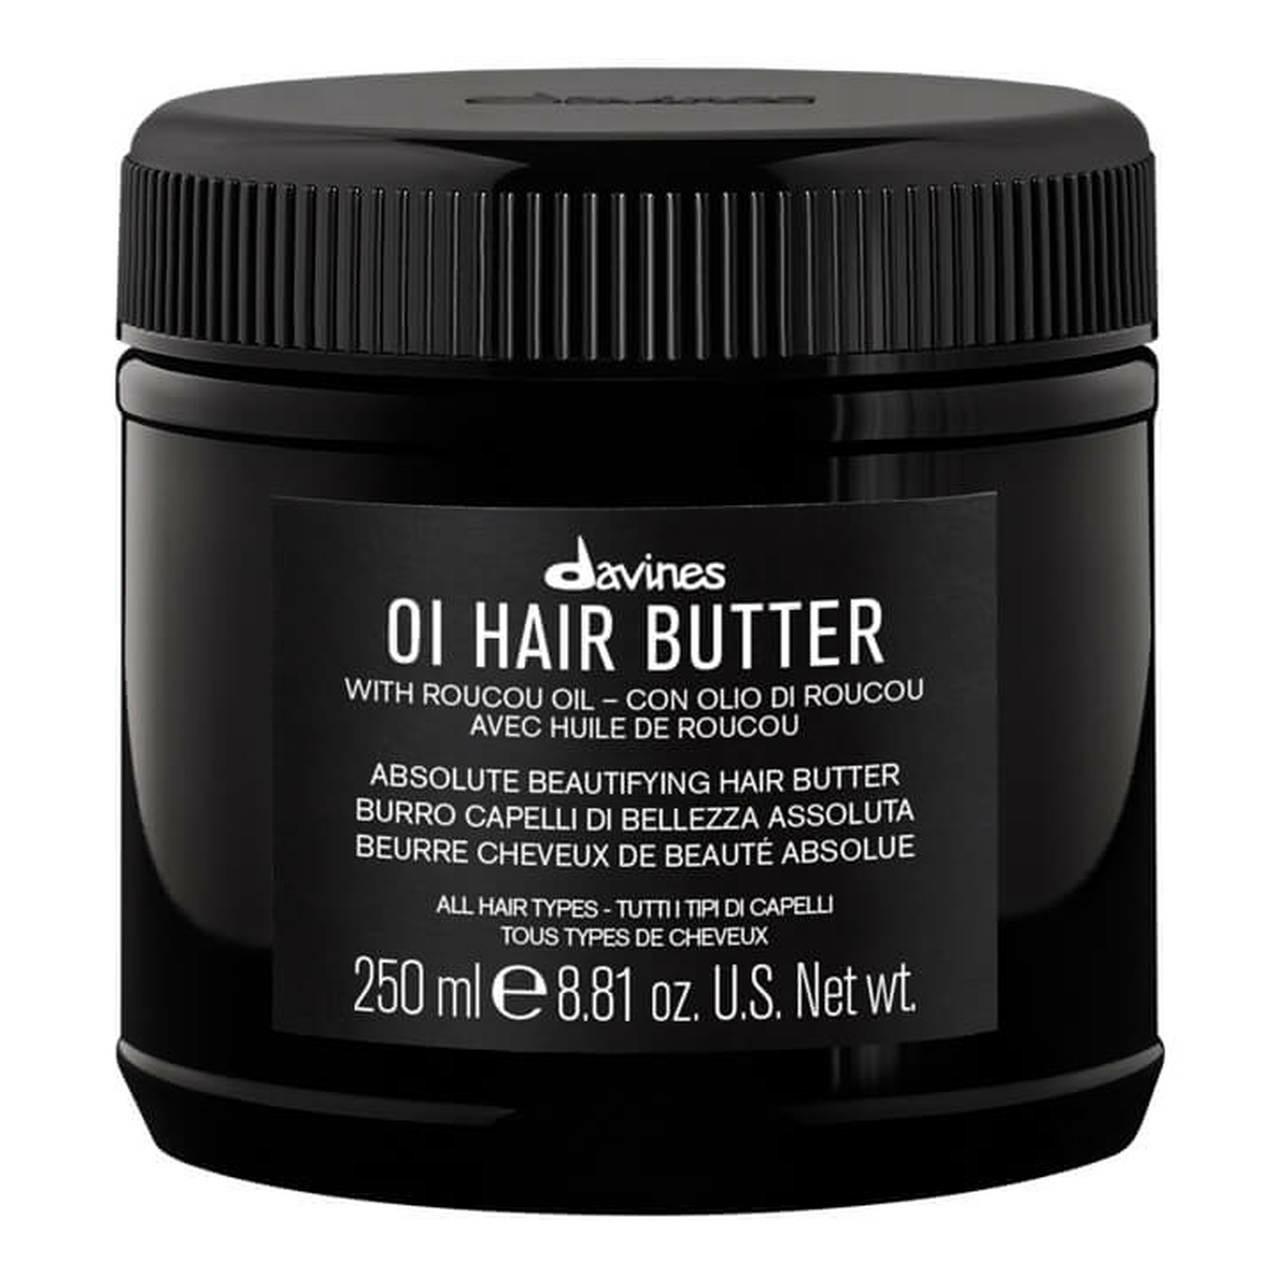 Davines Масло Питательное для Абсолютной Красоты Волос OI Hair Butter, 250 мл davines кондиционер для абсолютной красоты волос 250 мл